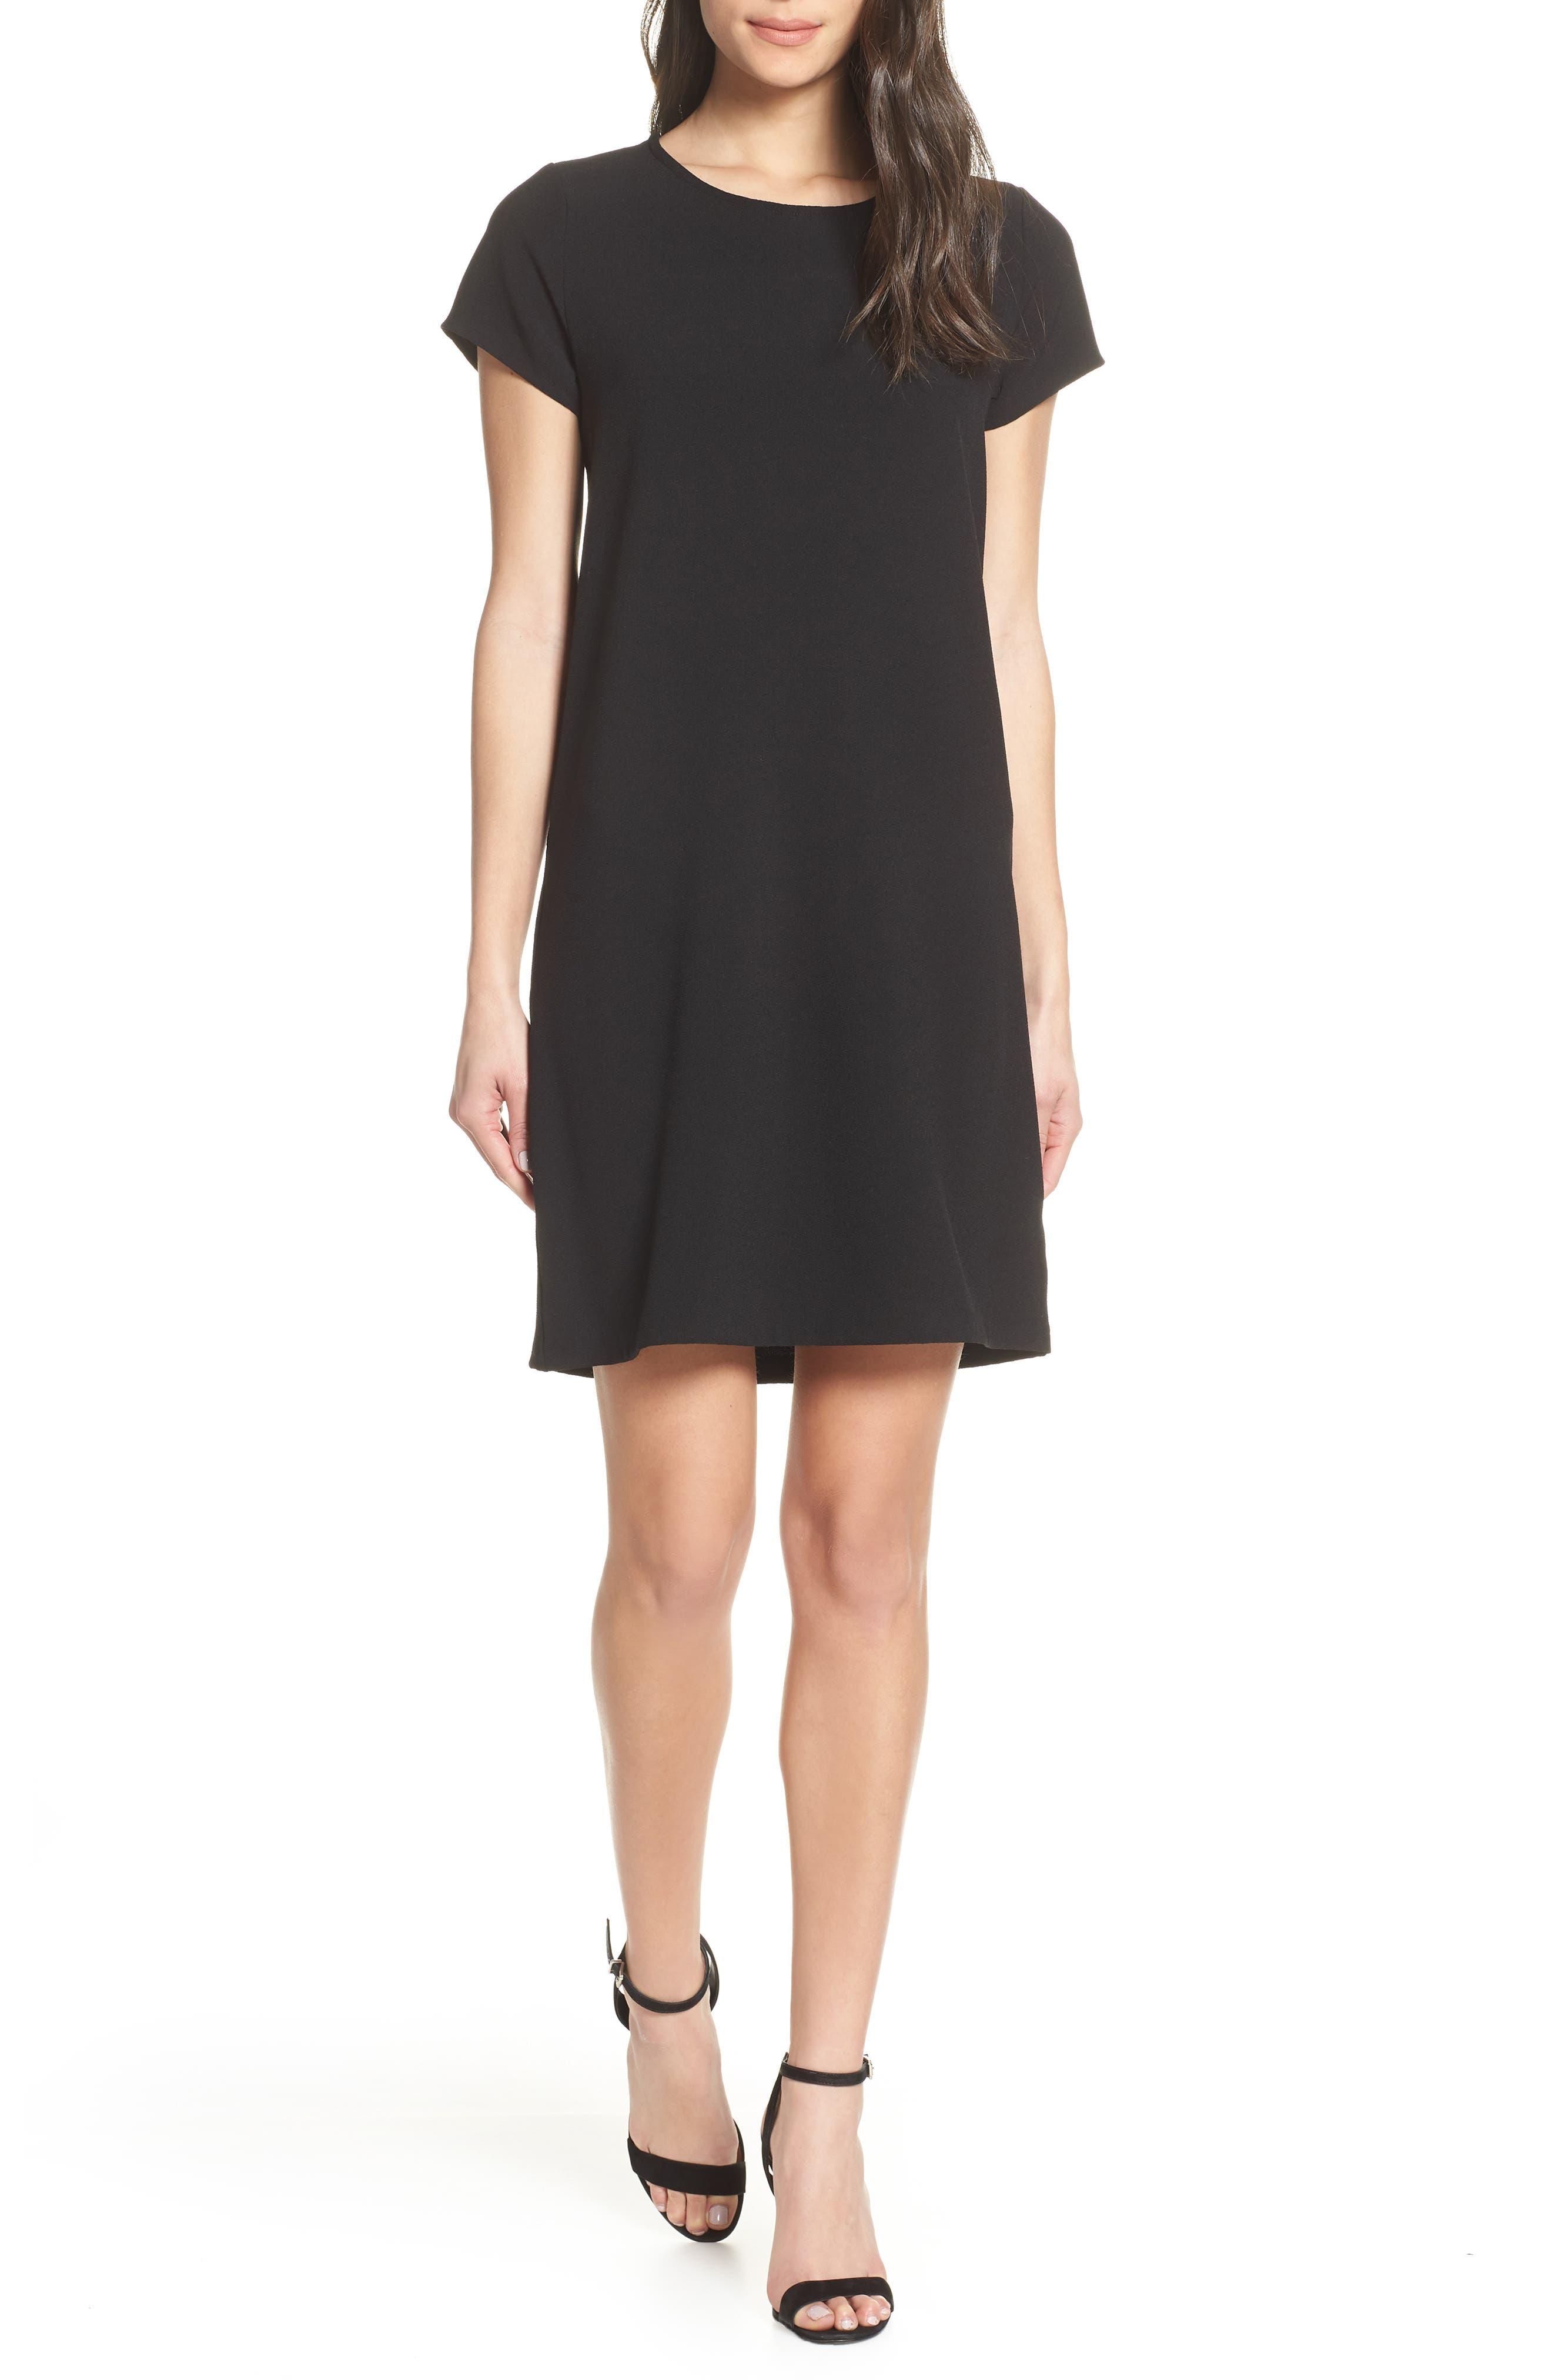 CHELSEA28, Crepe Shift Dress, Main thumbnail 1, color, BLACK